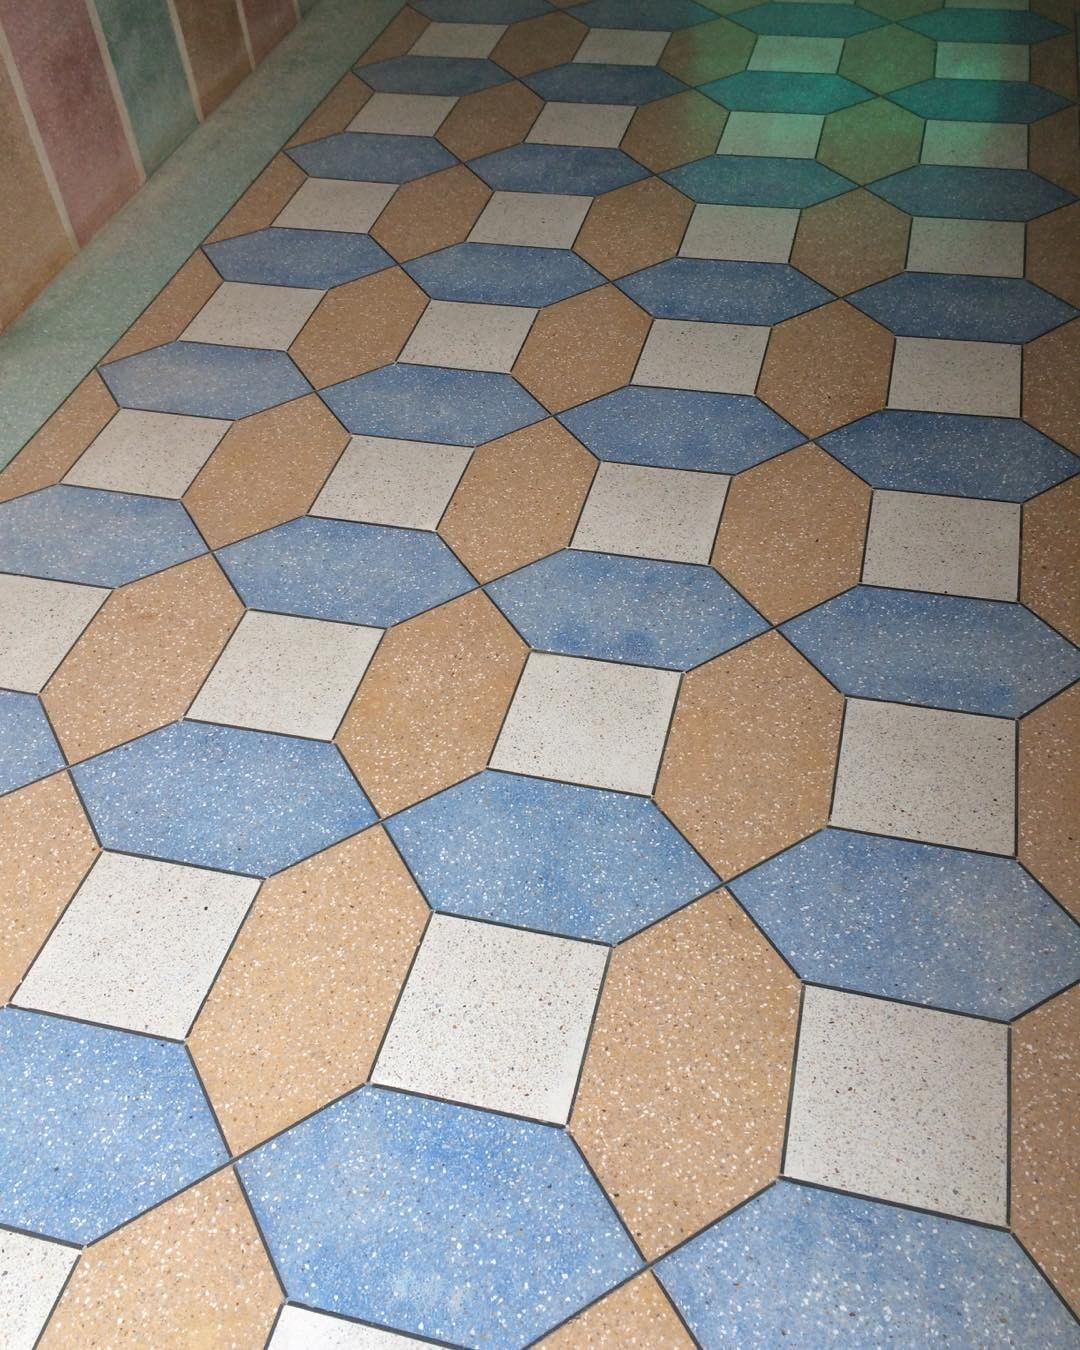 Terrazzo Mosaic Flooring In 2019